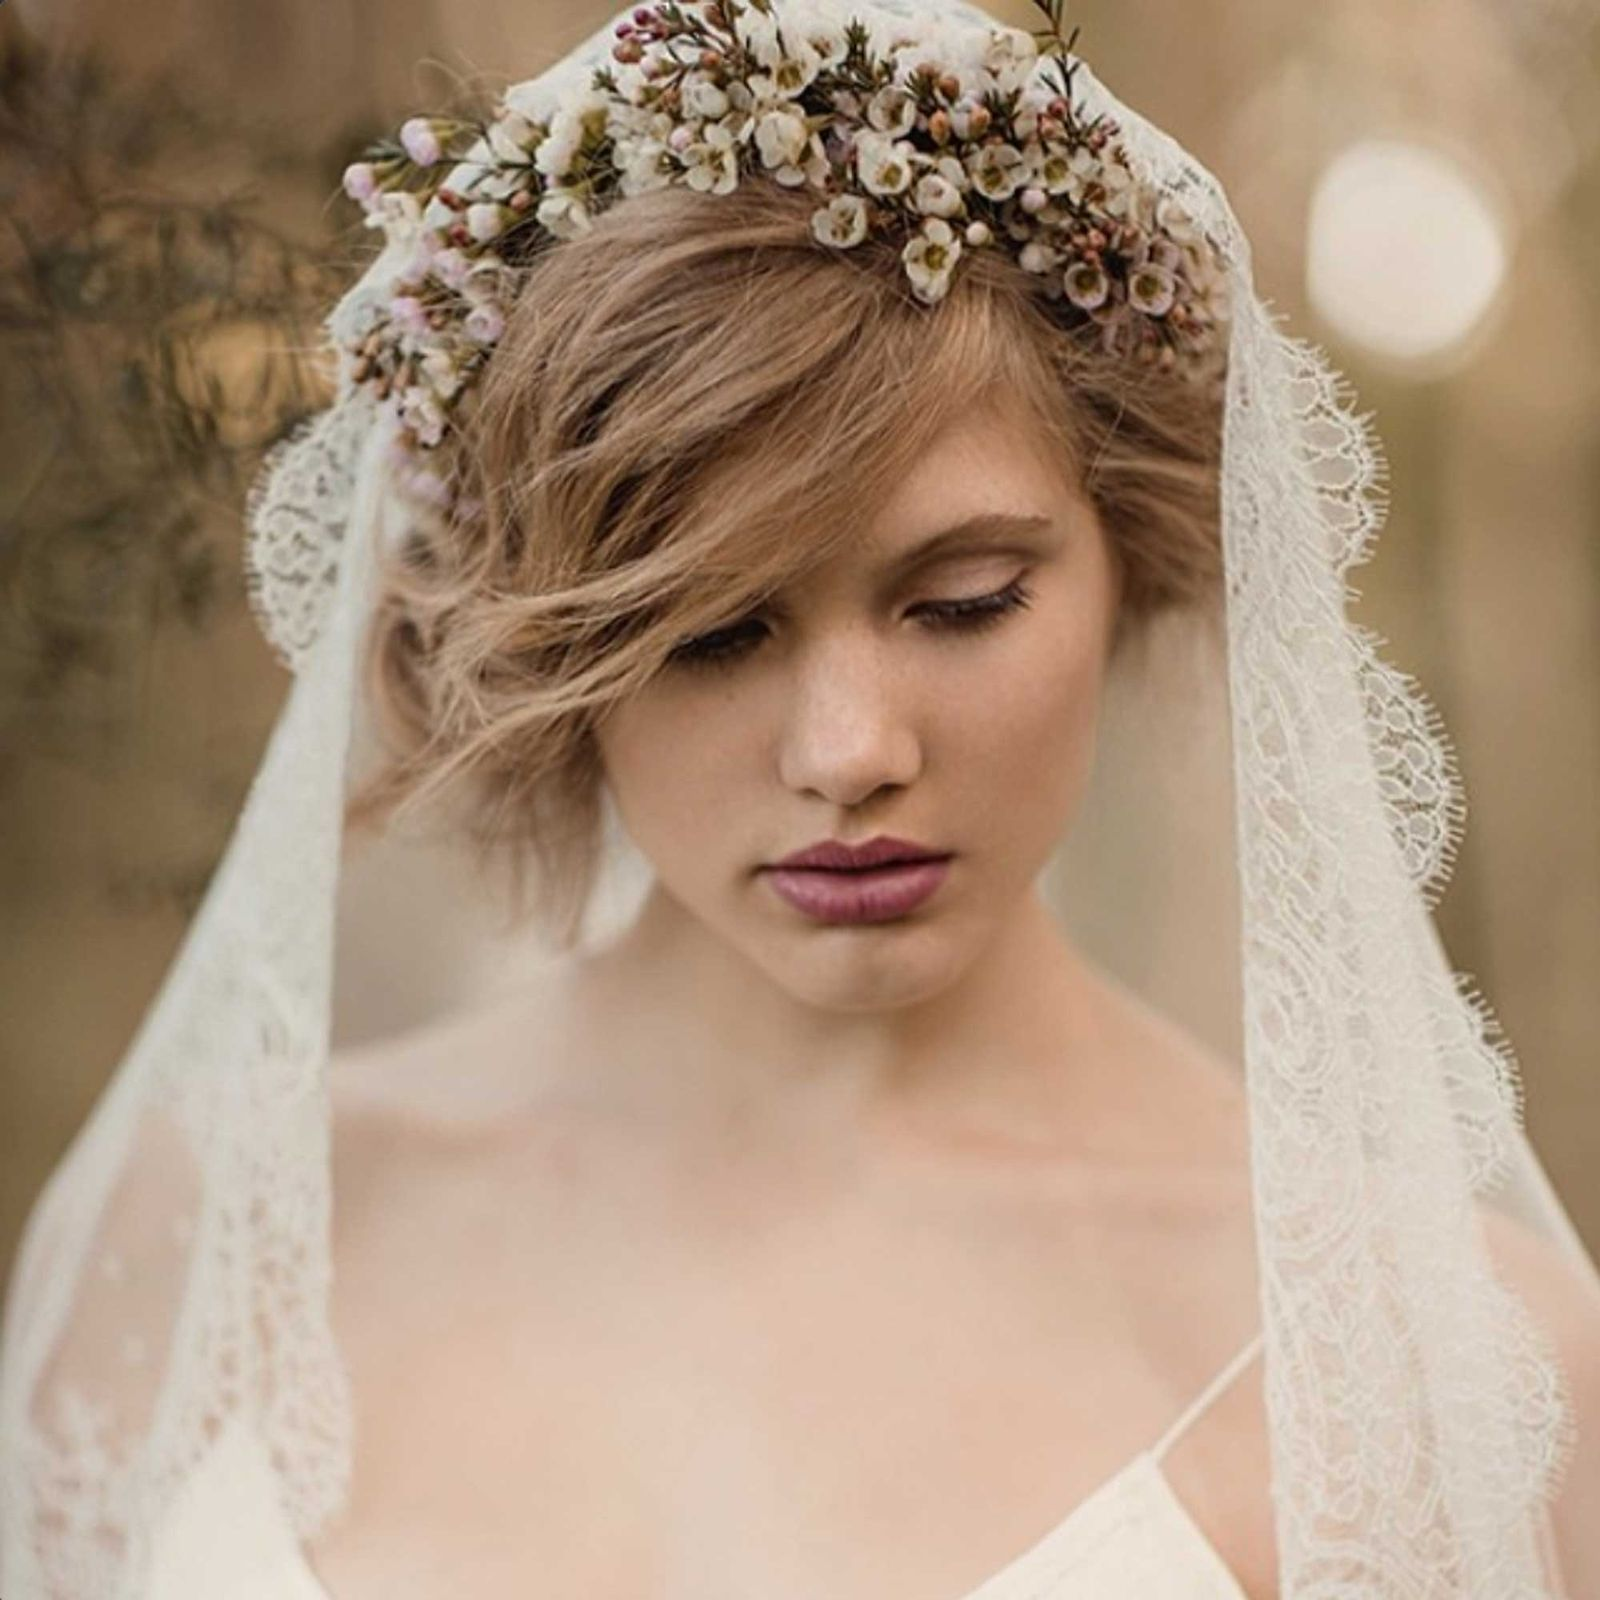 36 stunning wedding veils that will leave you speechless flower mantilla veil with flower crown cosmopolitan izmirmasajfo